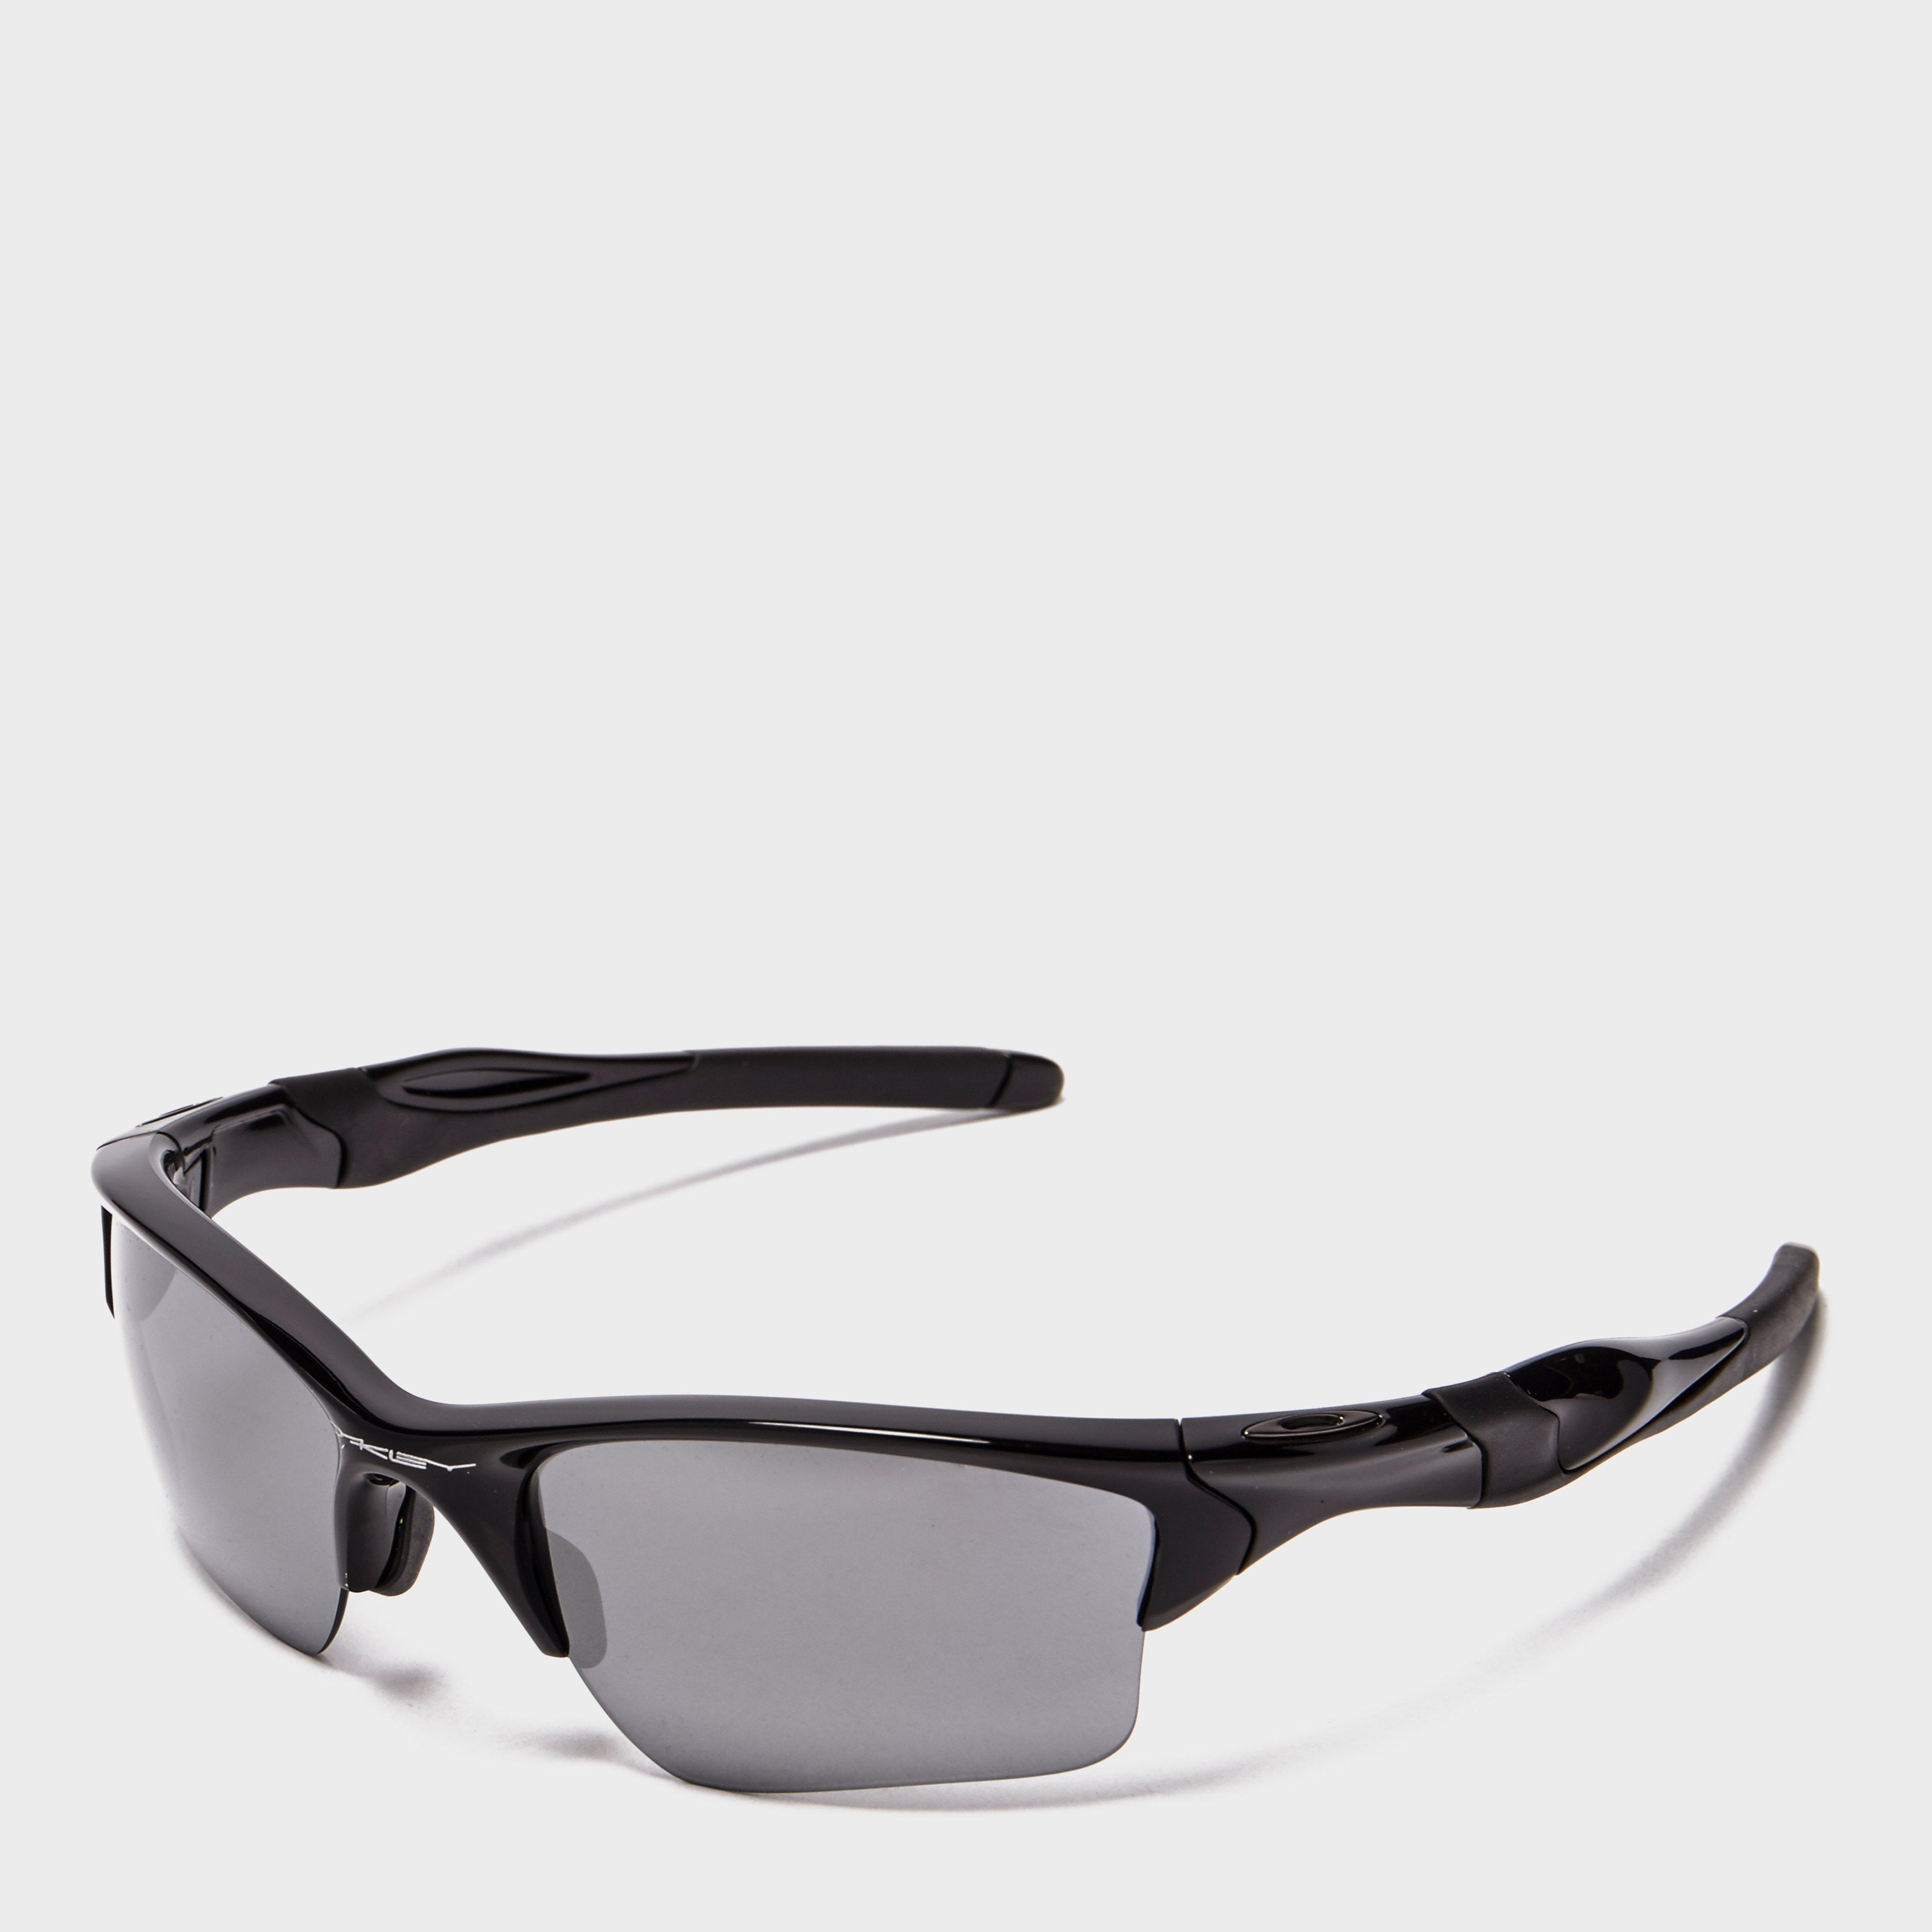 Oakley Half Jacket 2.0XL Black Iridium Sunglasses, Assorted